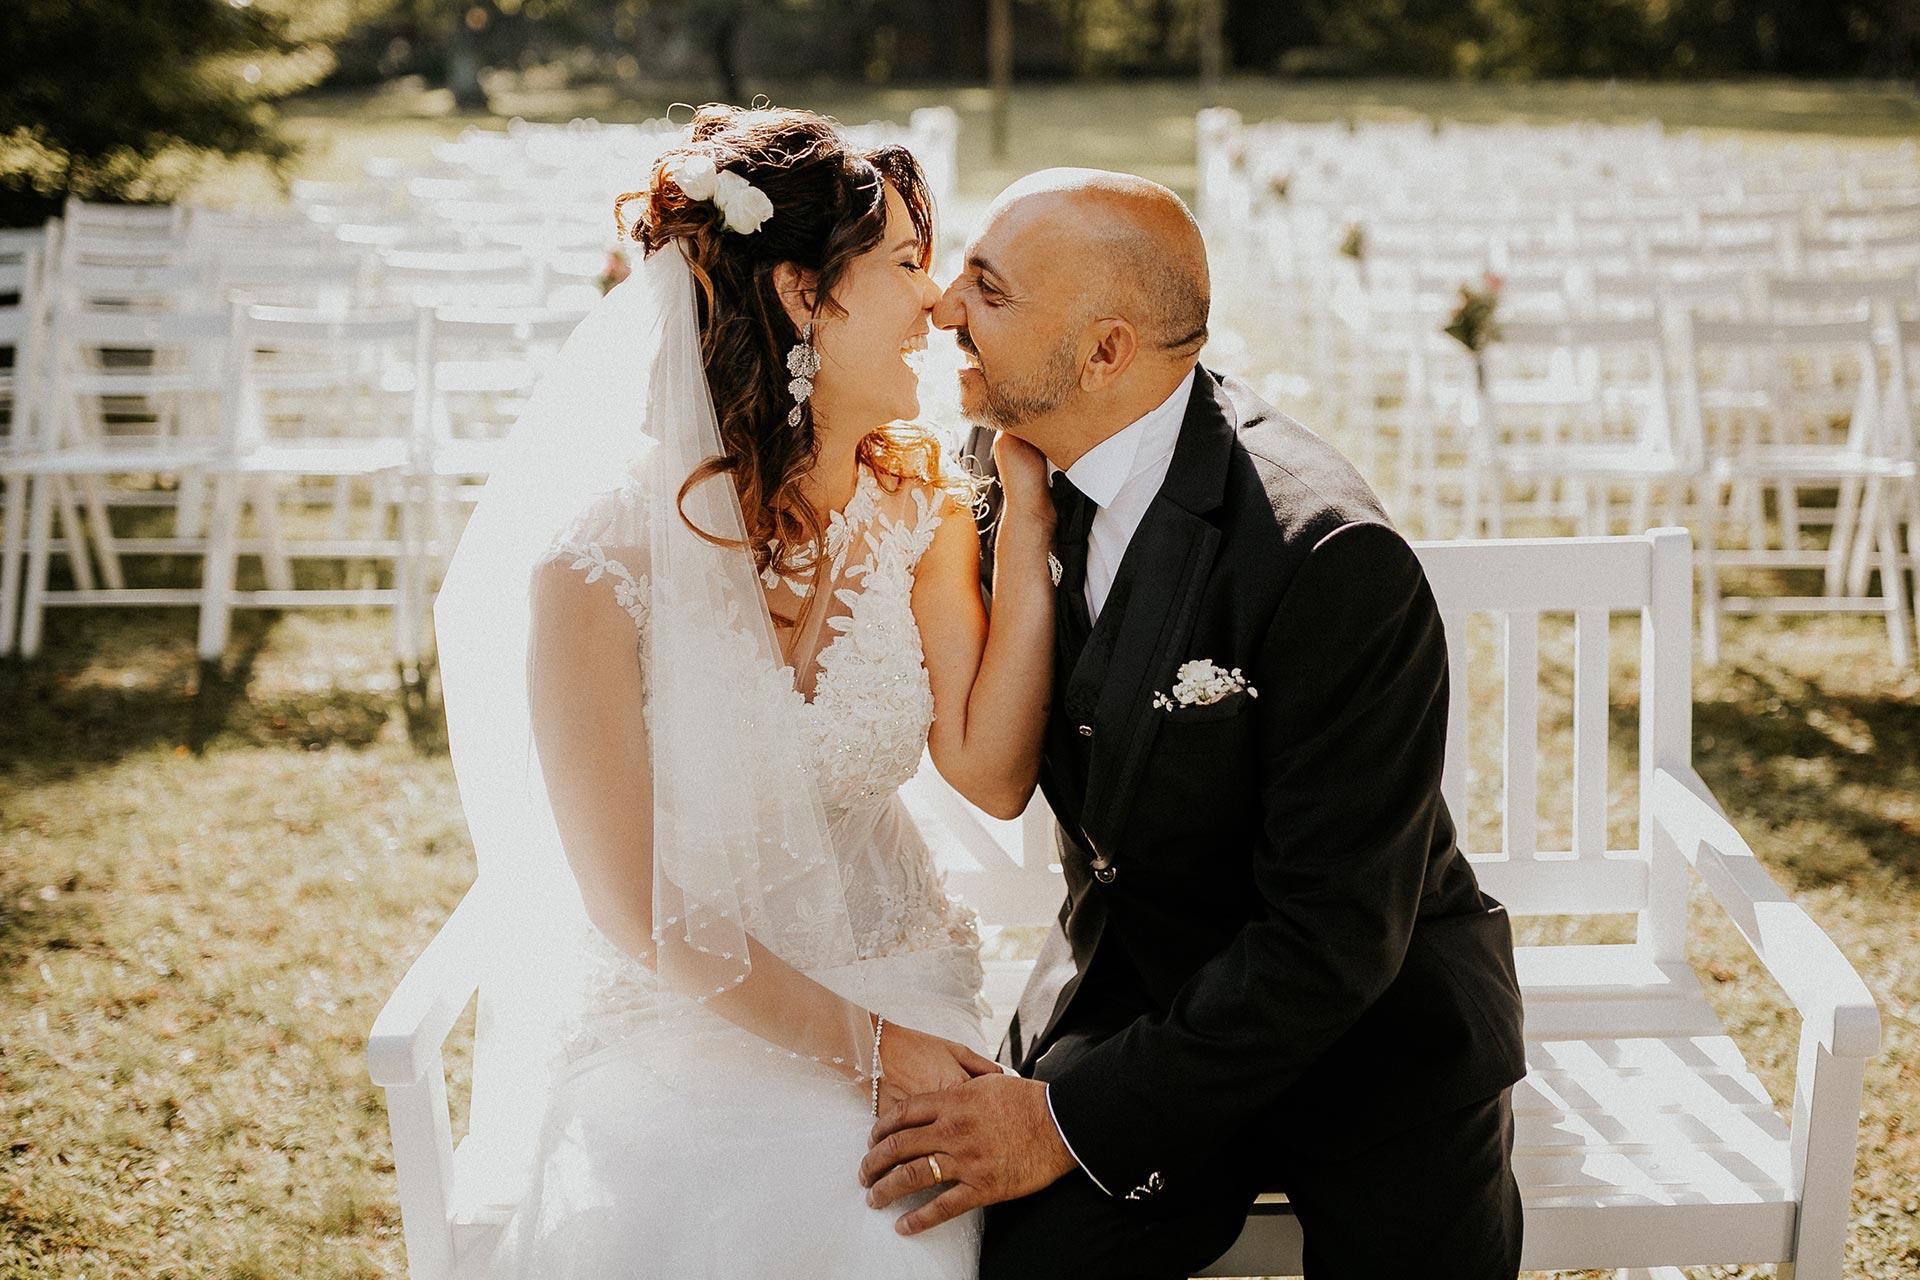 Steigenberger Inselhotel freie Trauung & Hochzeits-Shooting – Giovanna & Francesco